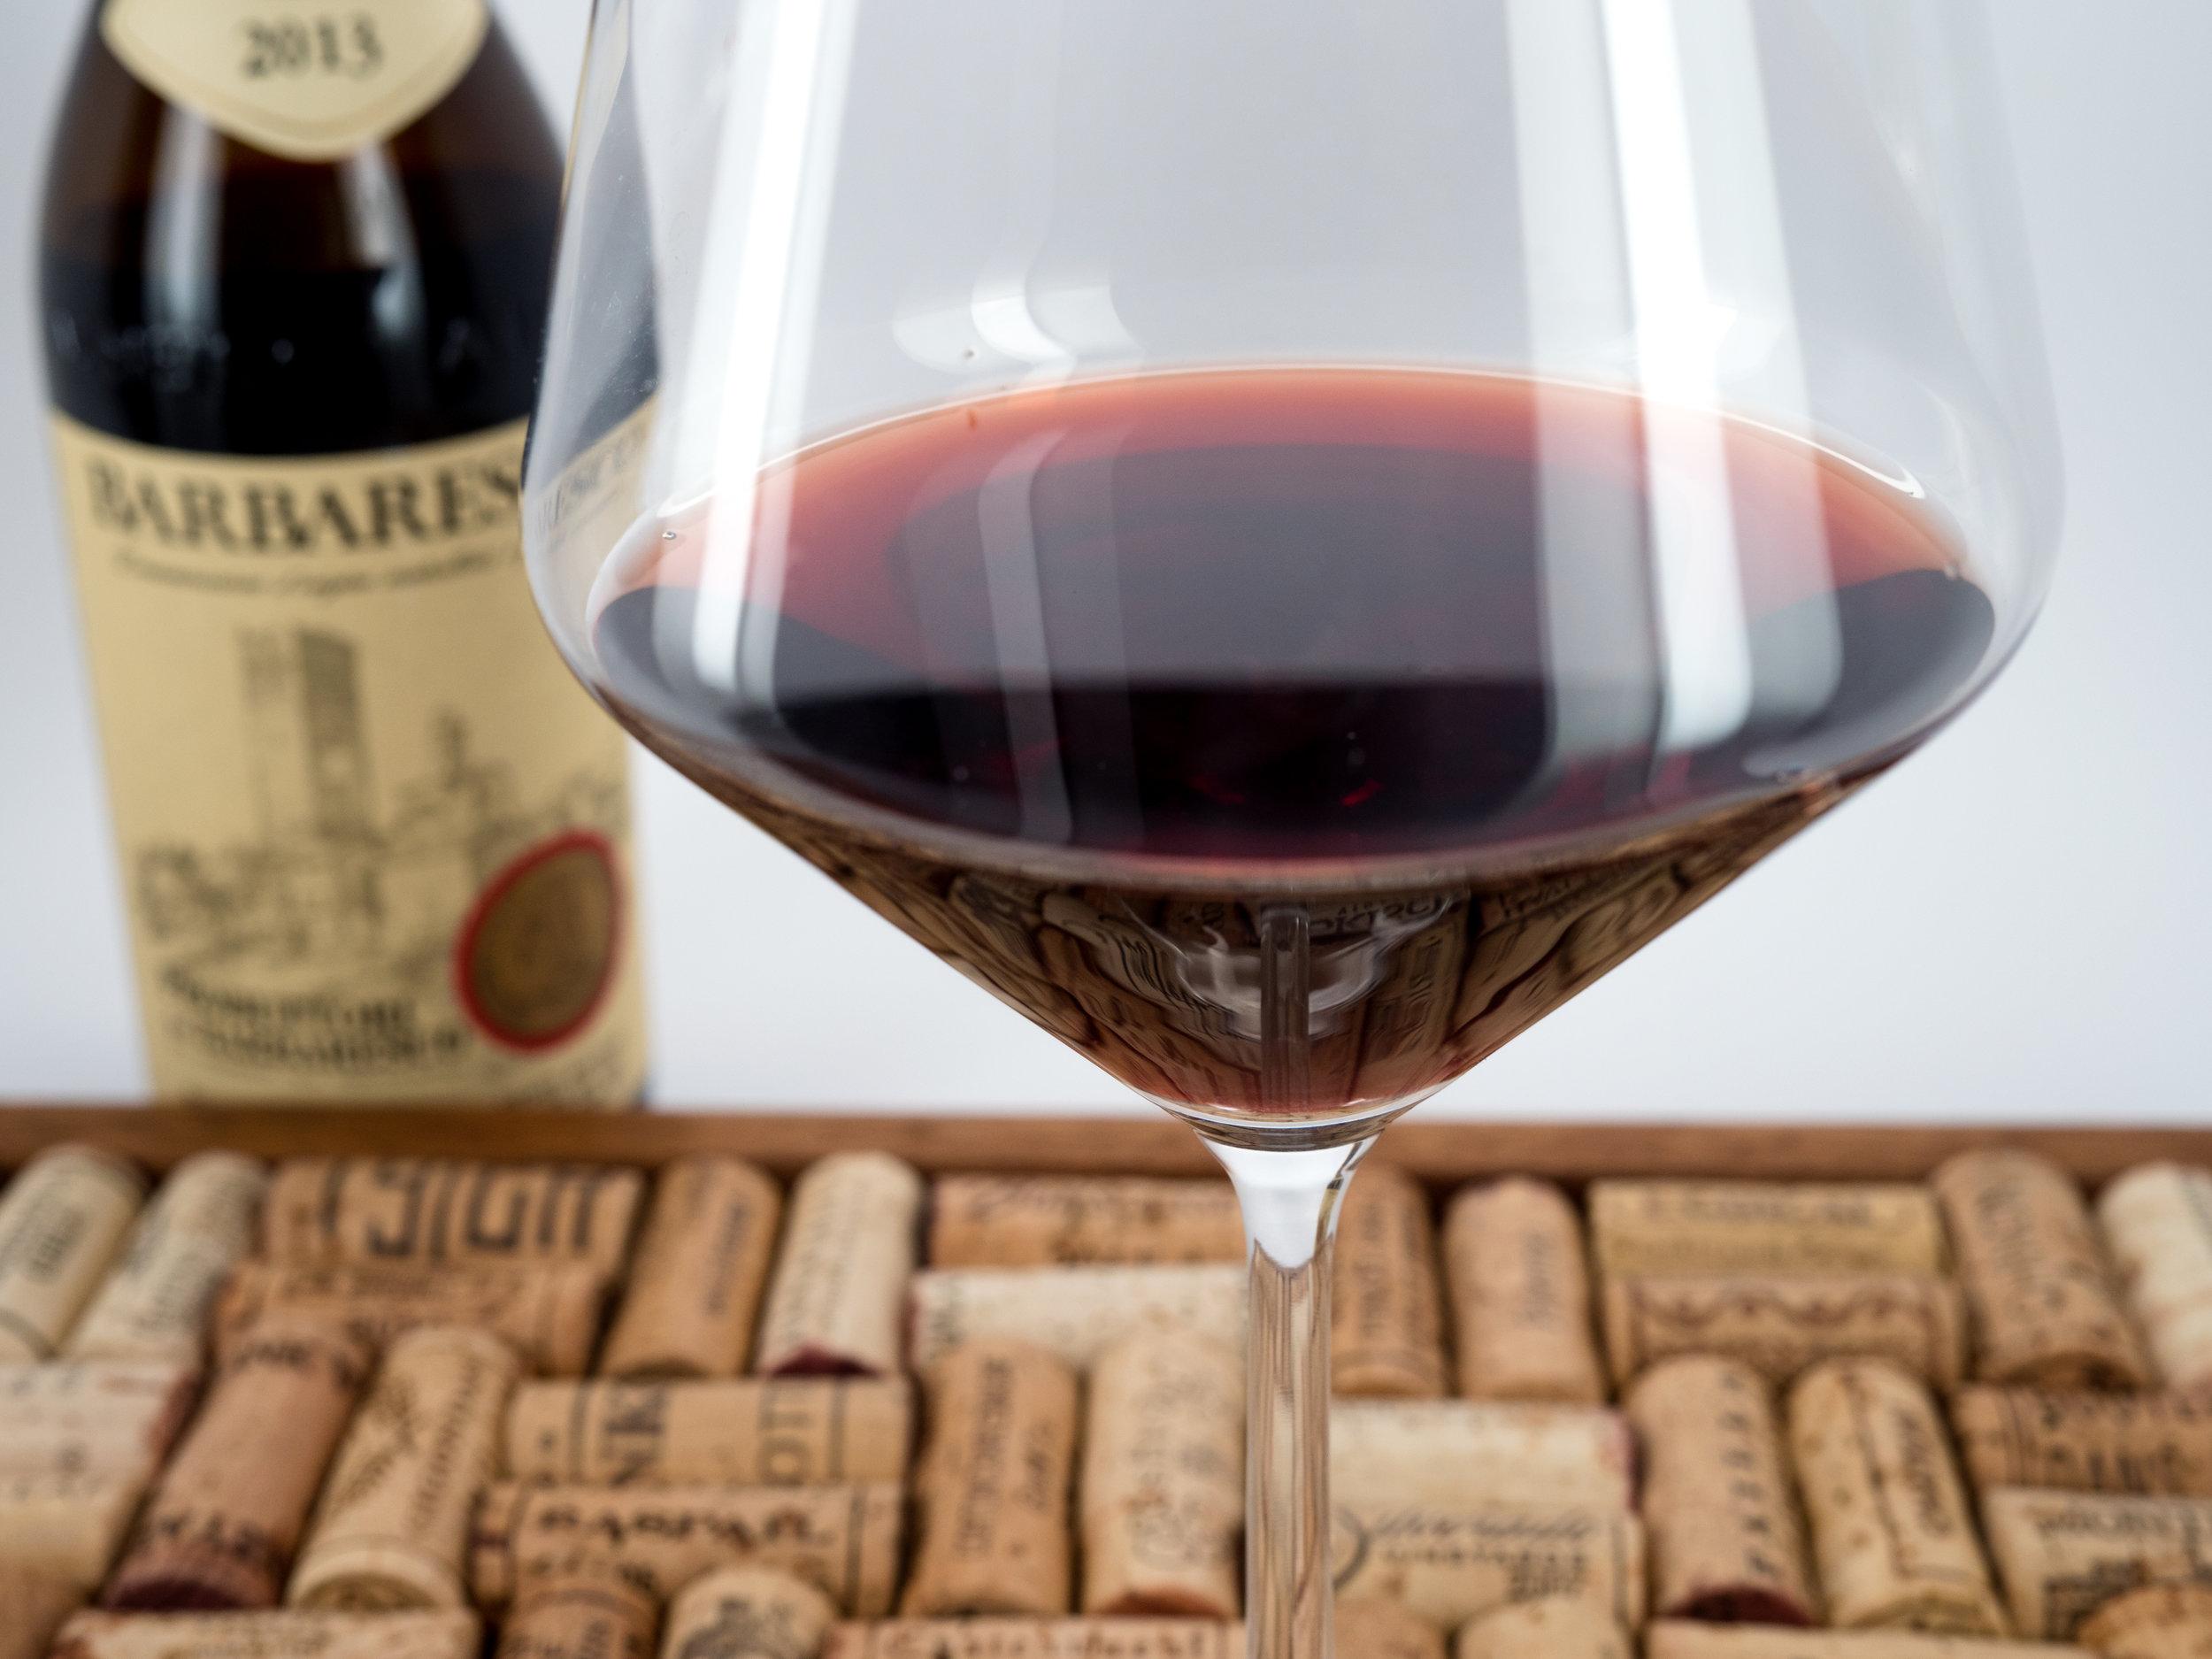 Musings by the Glass - Vino Pairing Optimization - Barbaresco Cork Reflections